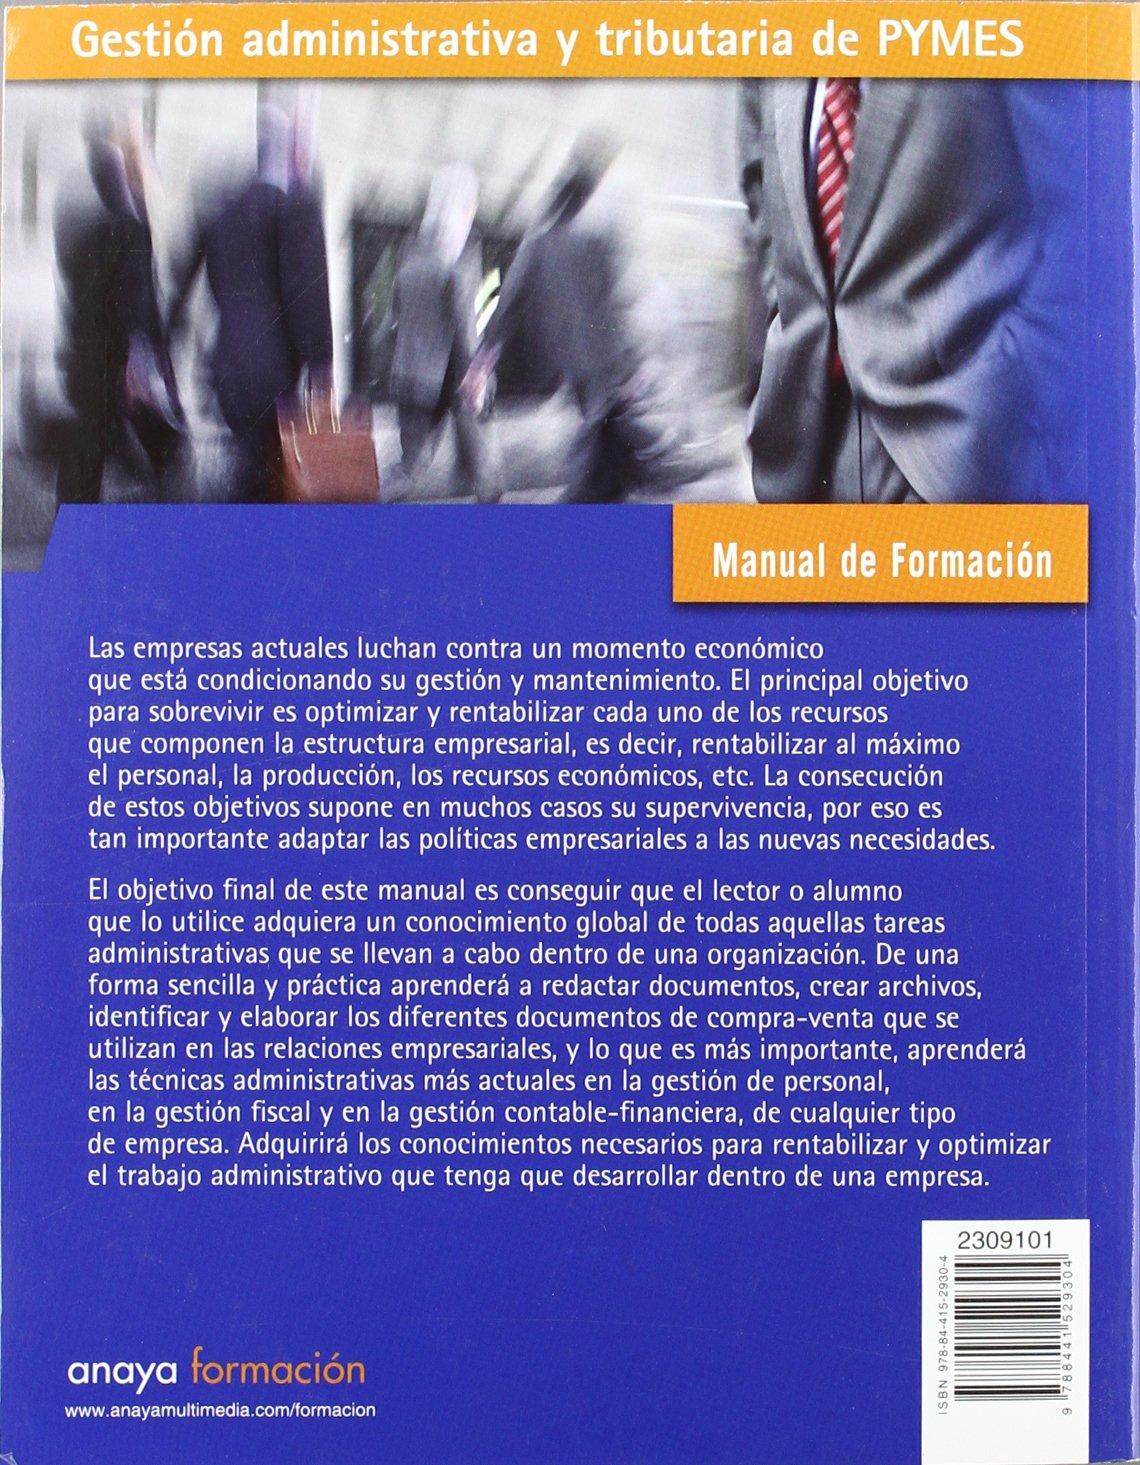 Gestion Administrativa Y Tributaria De Pymes